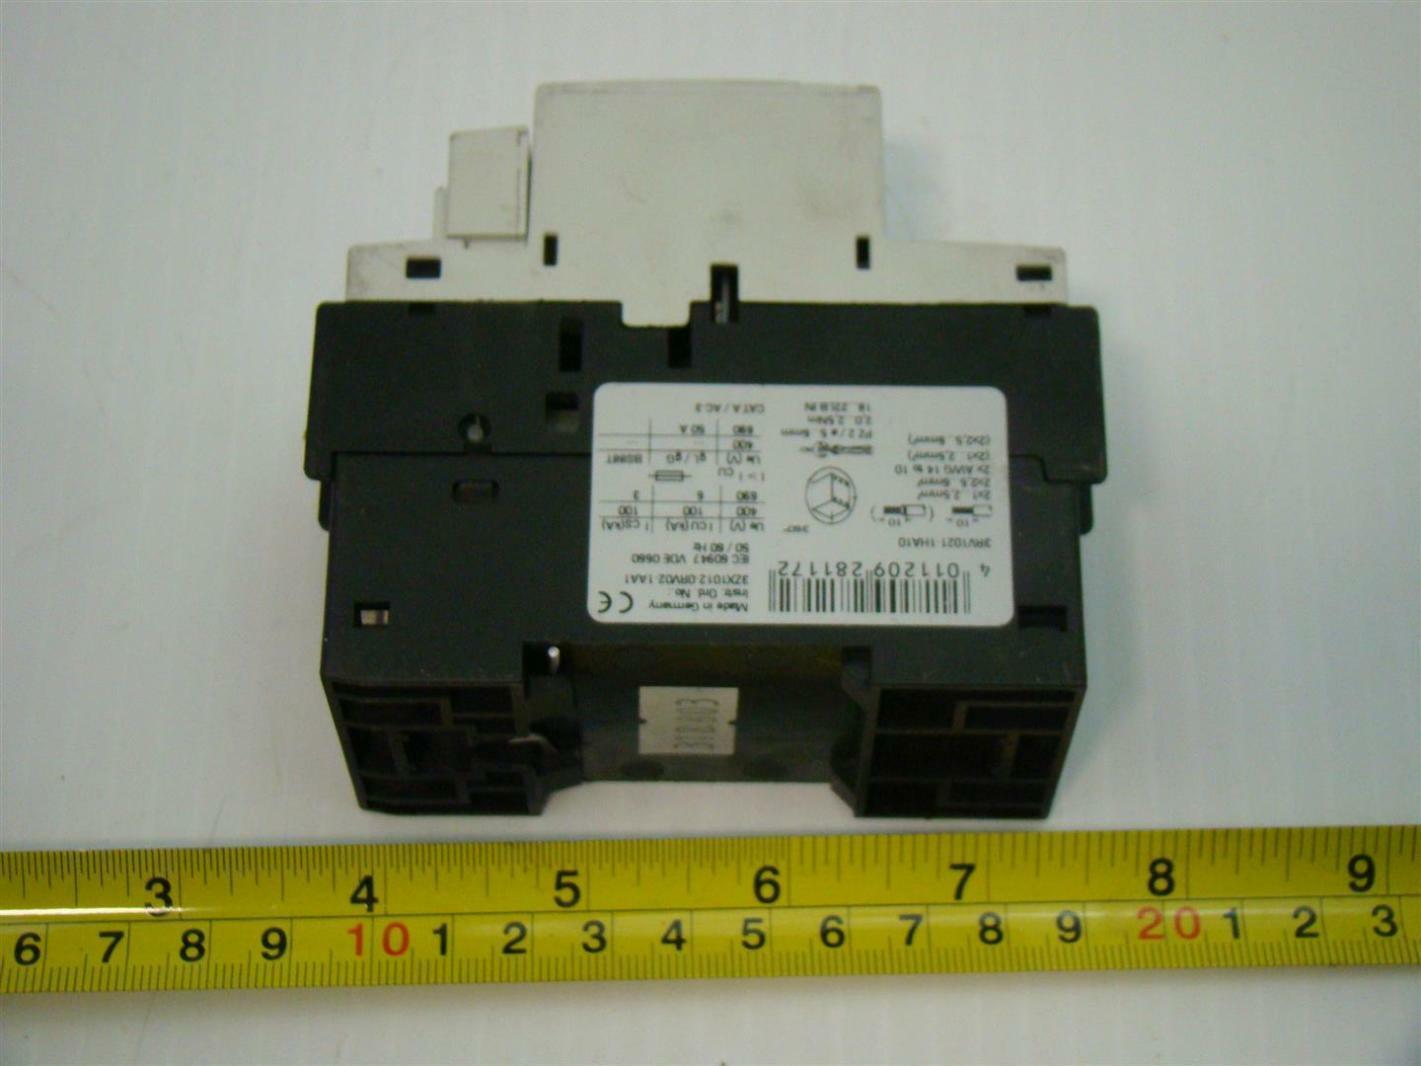 Siemens Motor Overload Protector 200 208v 30a 3ph 3rv1021 1ha10 7277 5 1 Amp Klixon Circuit Breaker Ebay